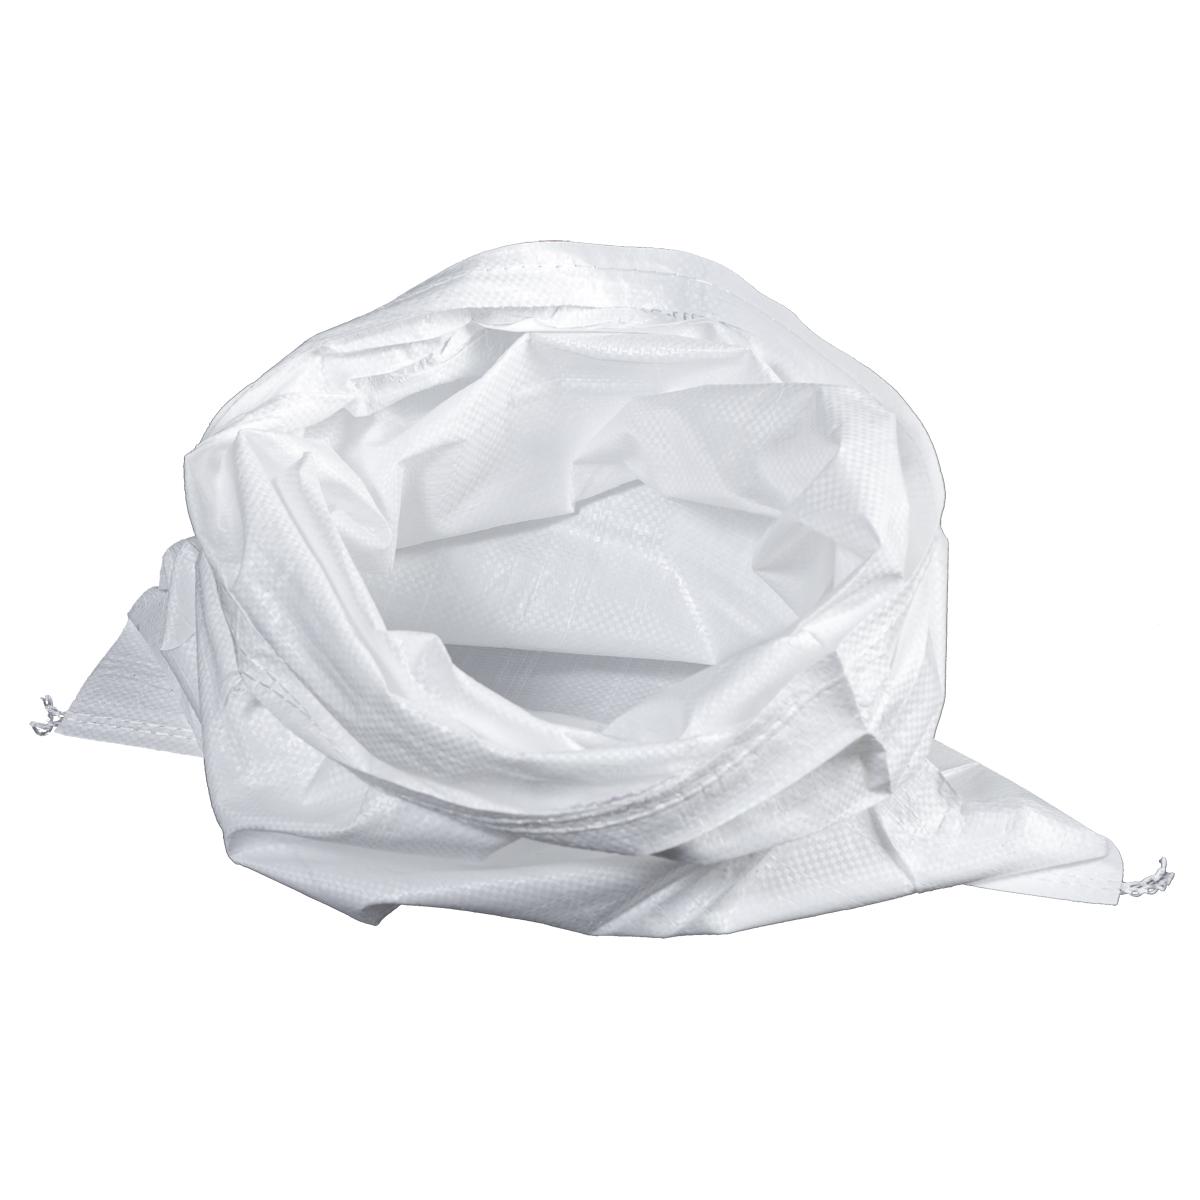 50 Stk. HaGa® Gewebesack 50 x 80cm Schwerlastsack PP-Sack Getreidesack weiß